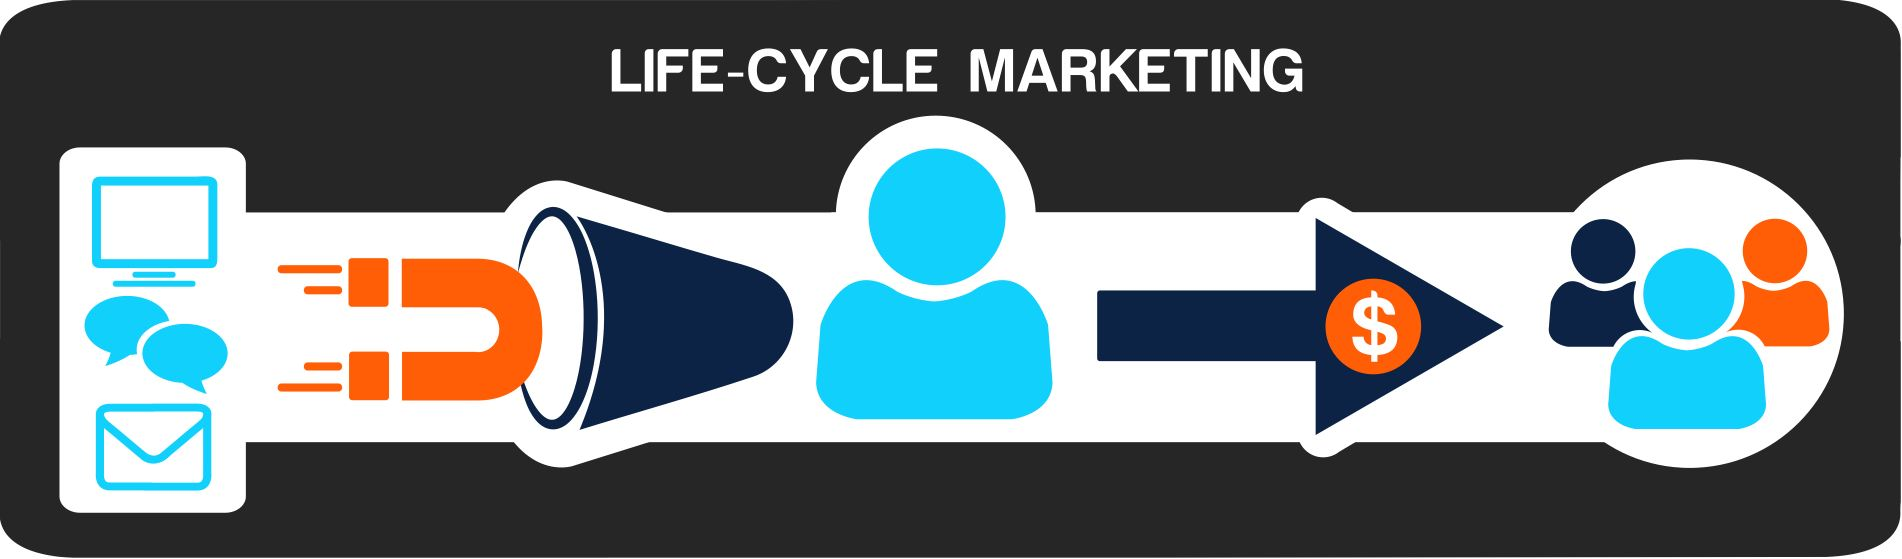 Life Cycle Marketing